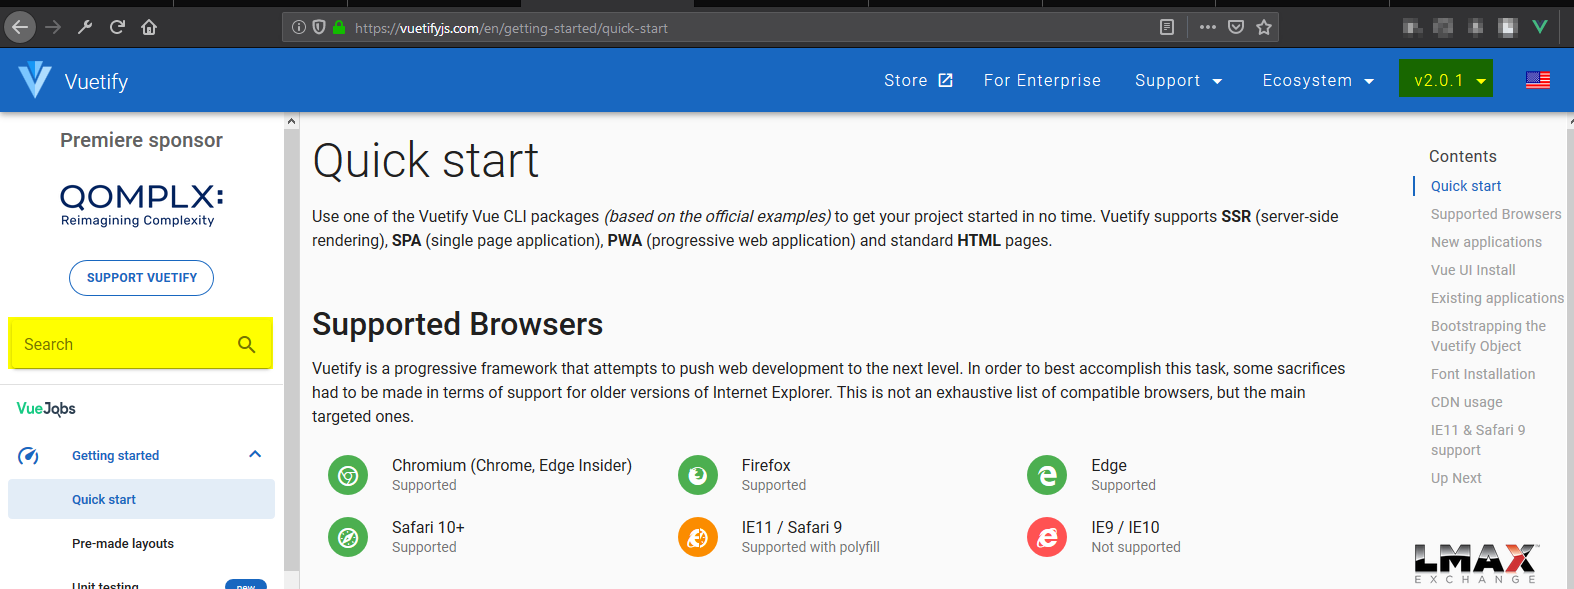 Documentation] No searchbar for v1 5 documentation · Issue #8034